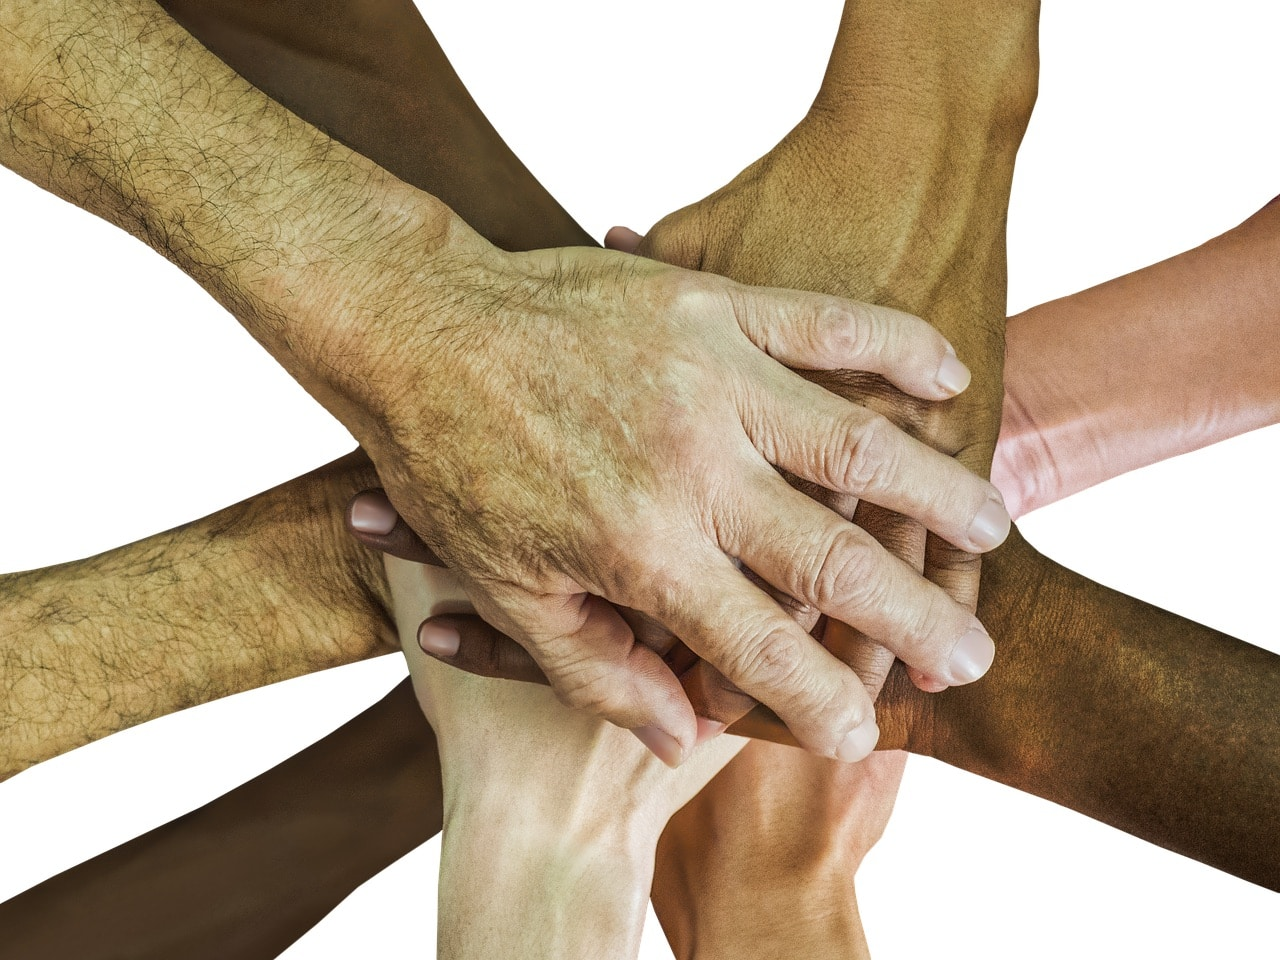 teambuilding - teamwork - hands